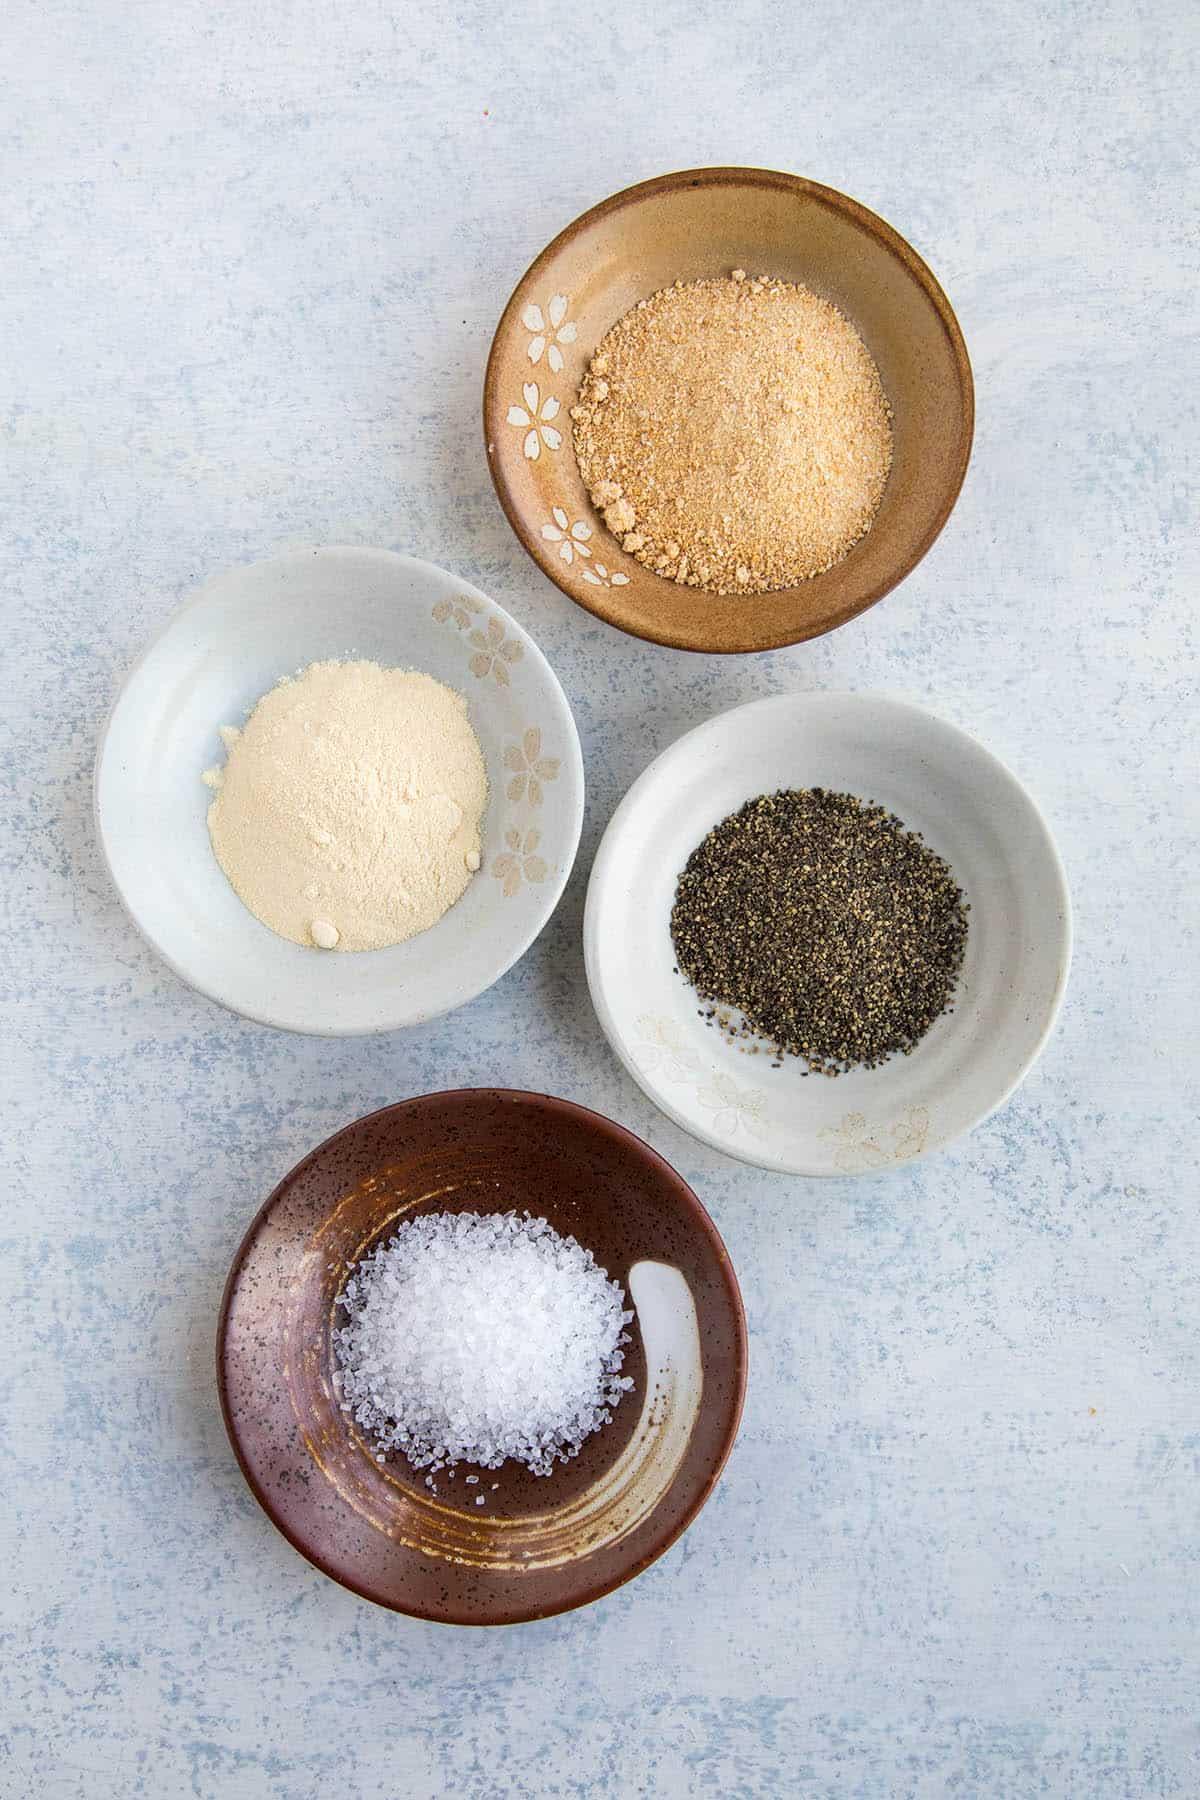 The spices in my Homemade Blackening Seasoning recipe